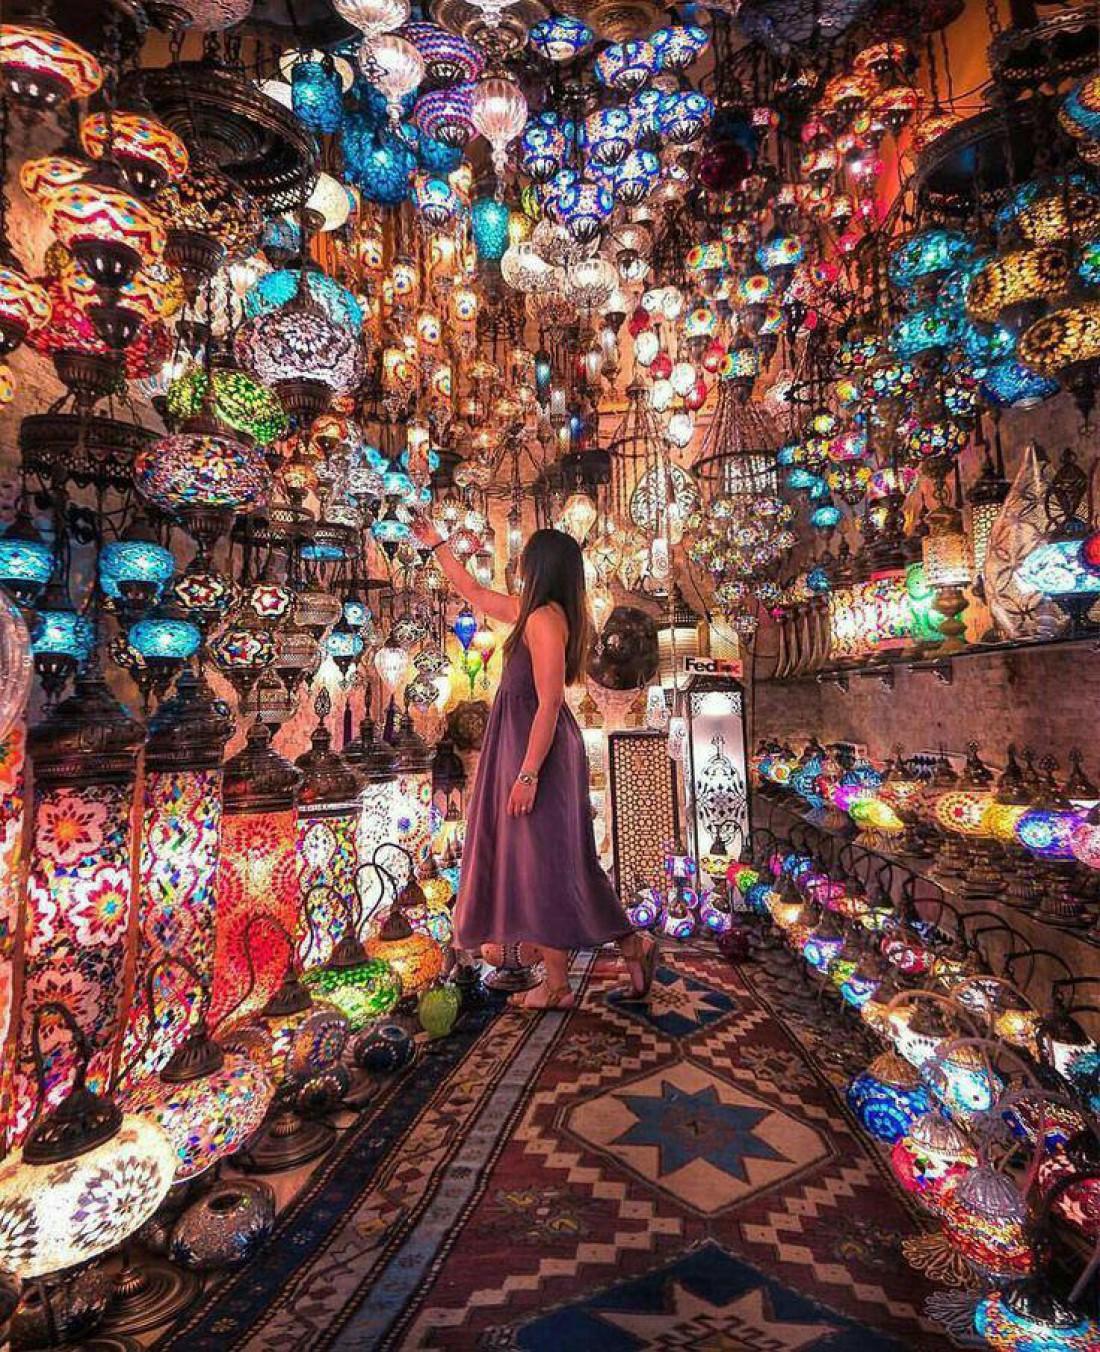 Гранд Базар - один из самых крупных крытых рынков мира